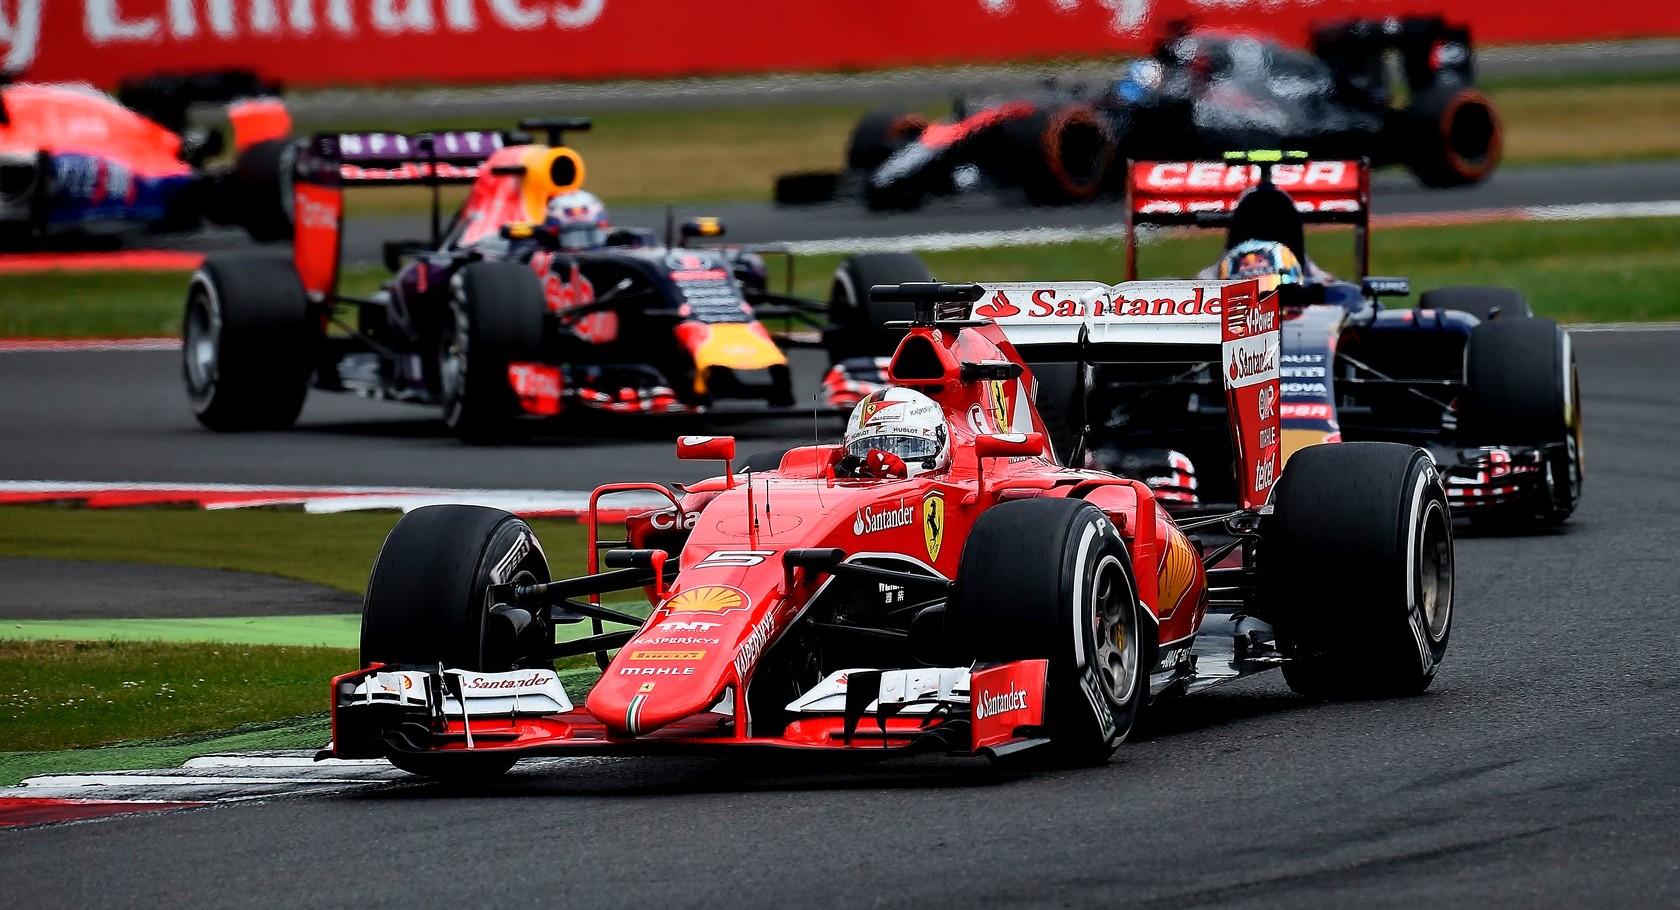 070615-SC-Ferrari-Santander-make-another-podium-appearance